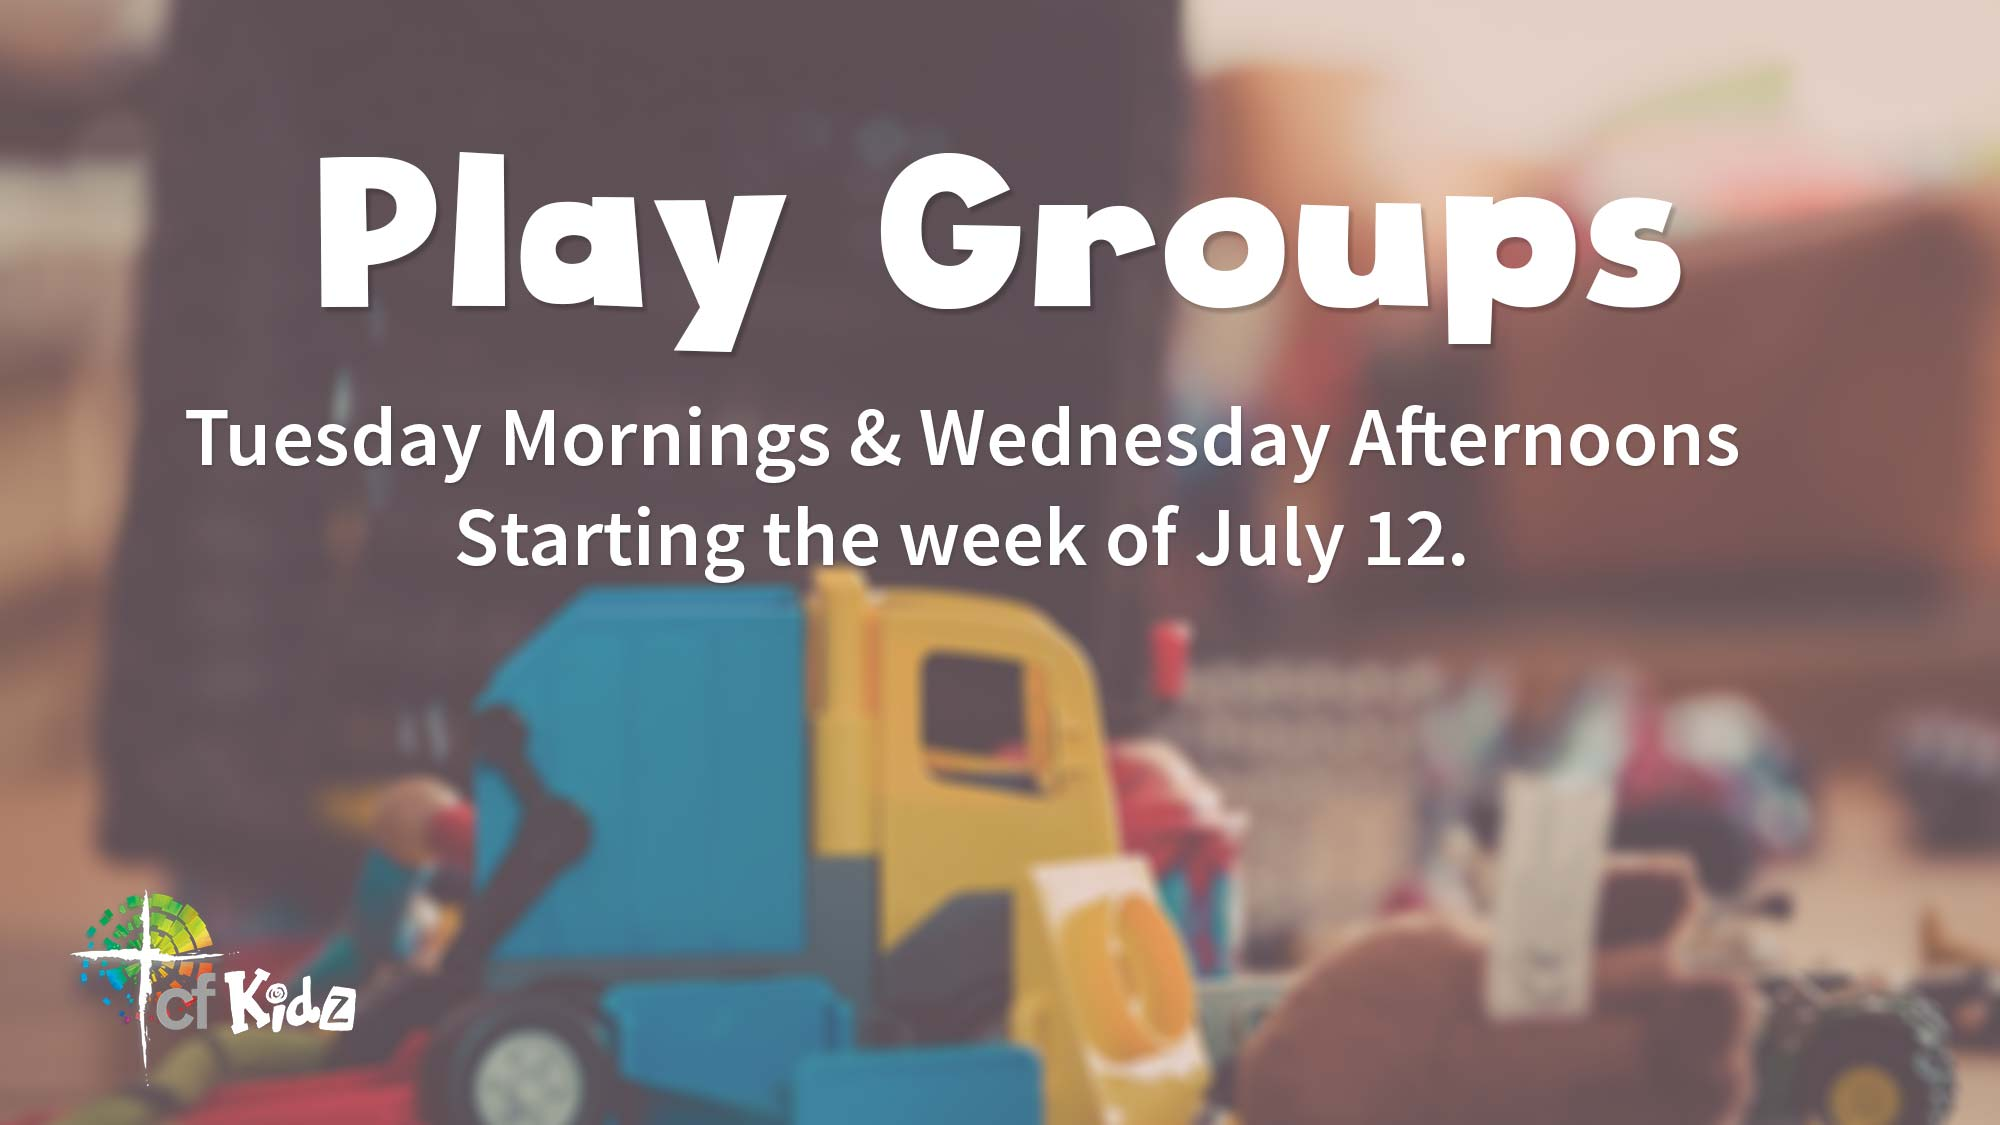 playgroups-general